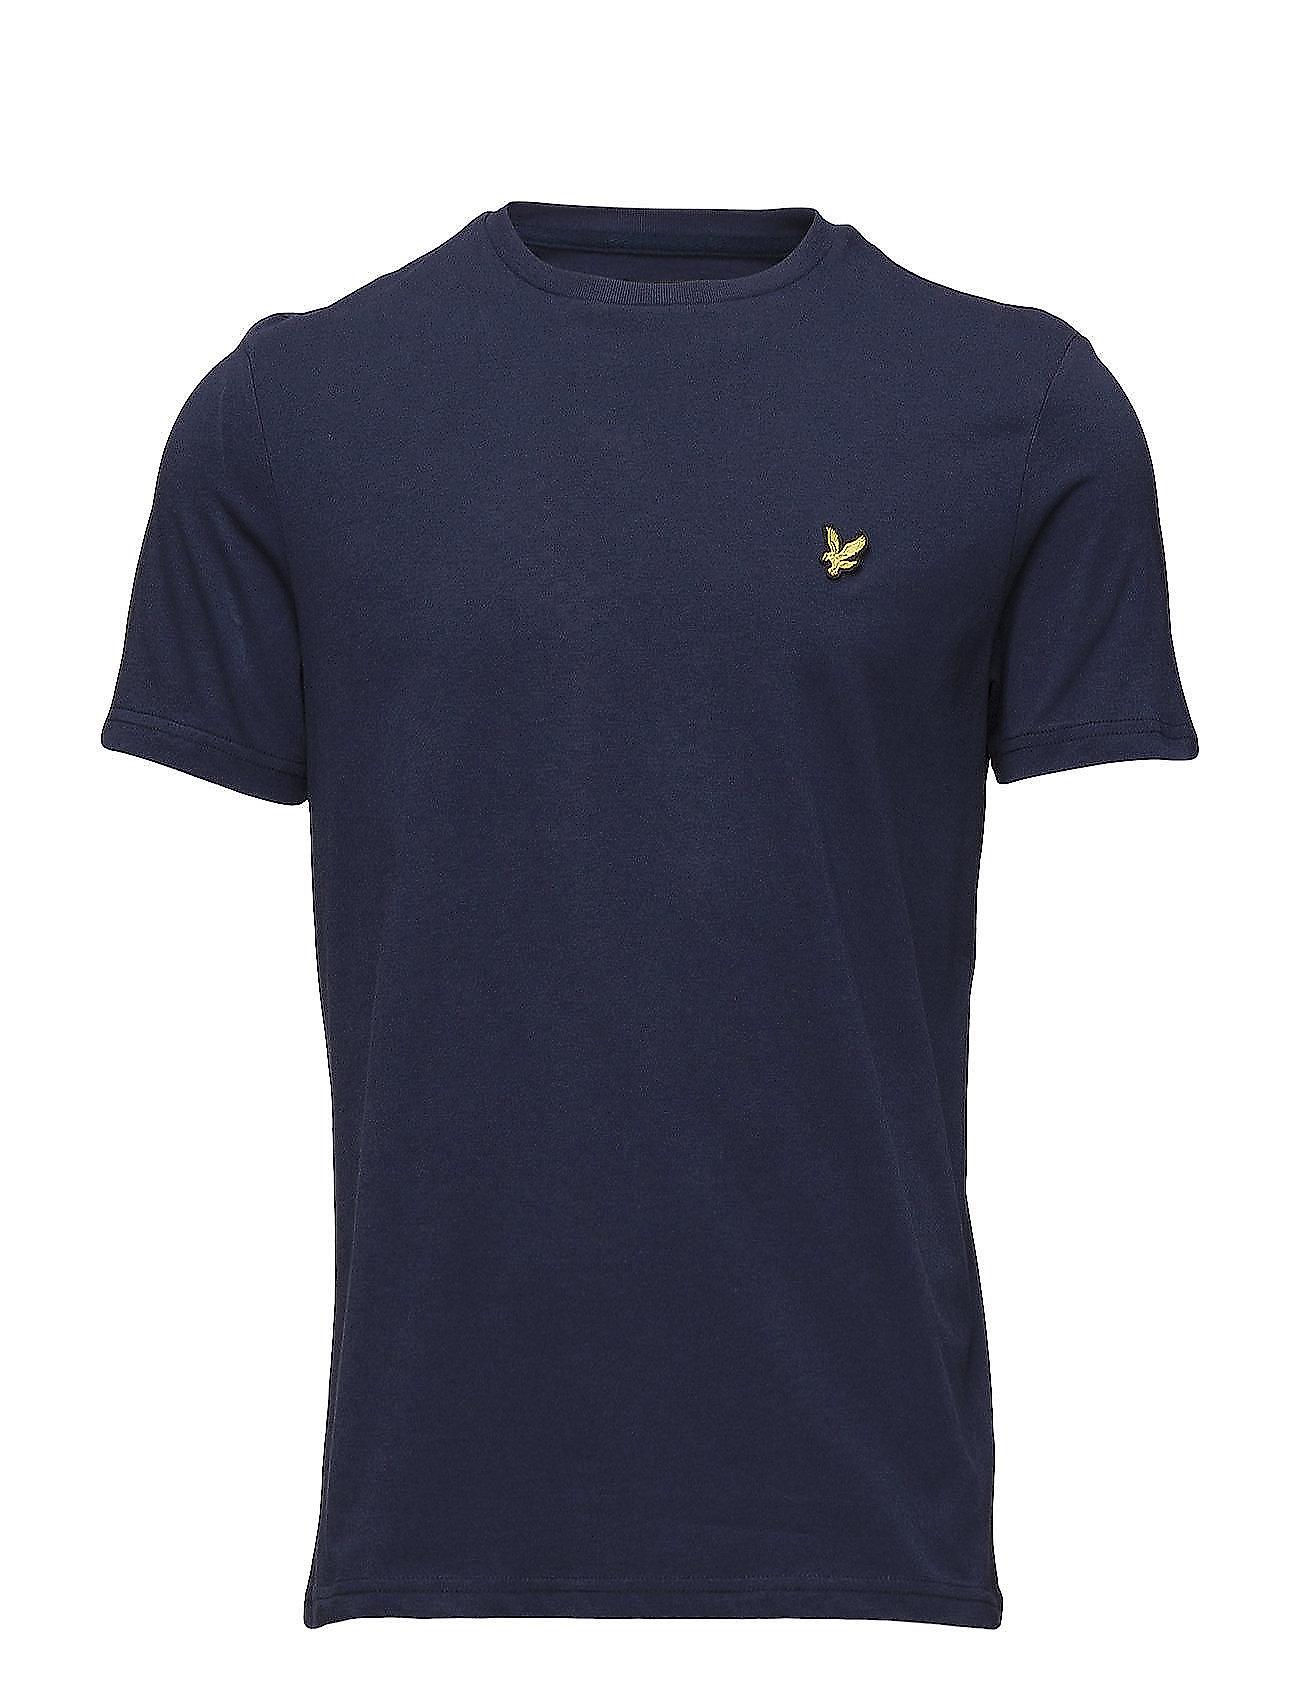 Lyle & Scott Crew Neck T-Shirt - NAVY